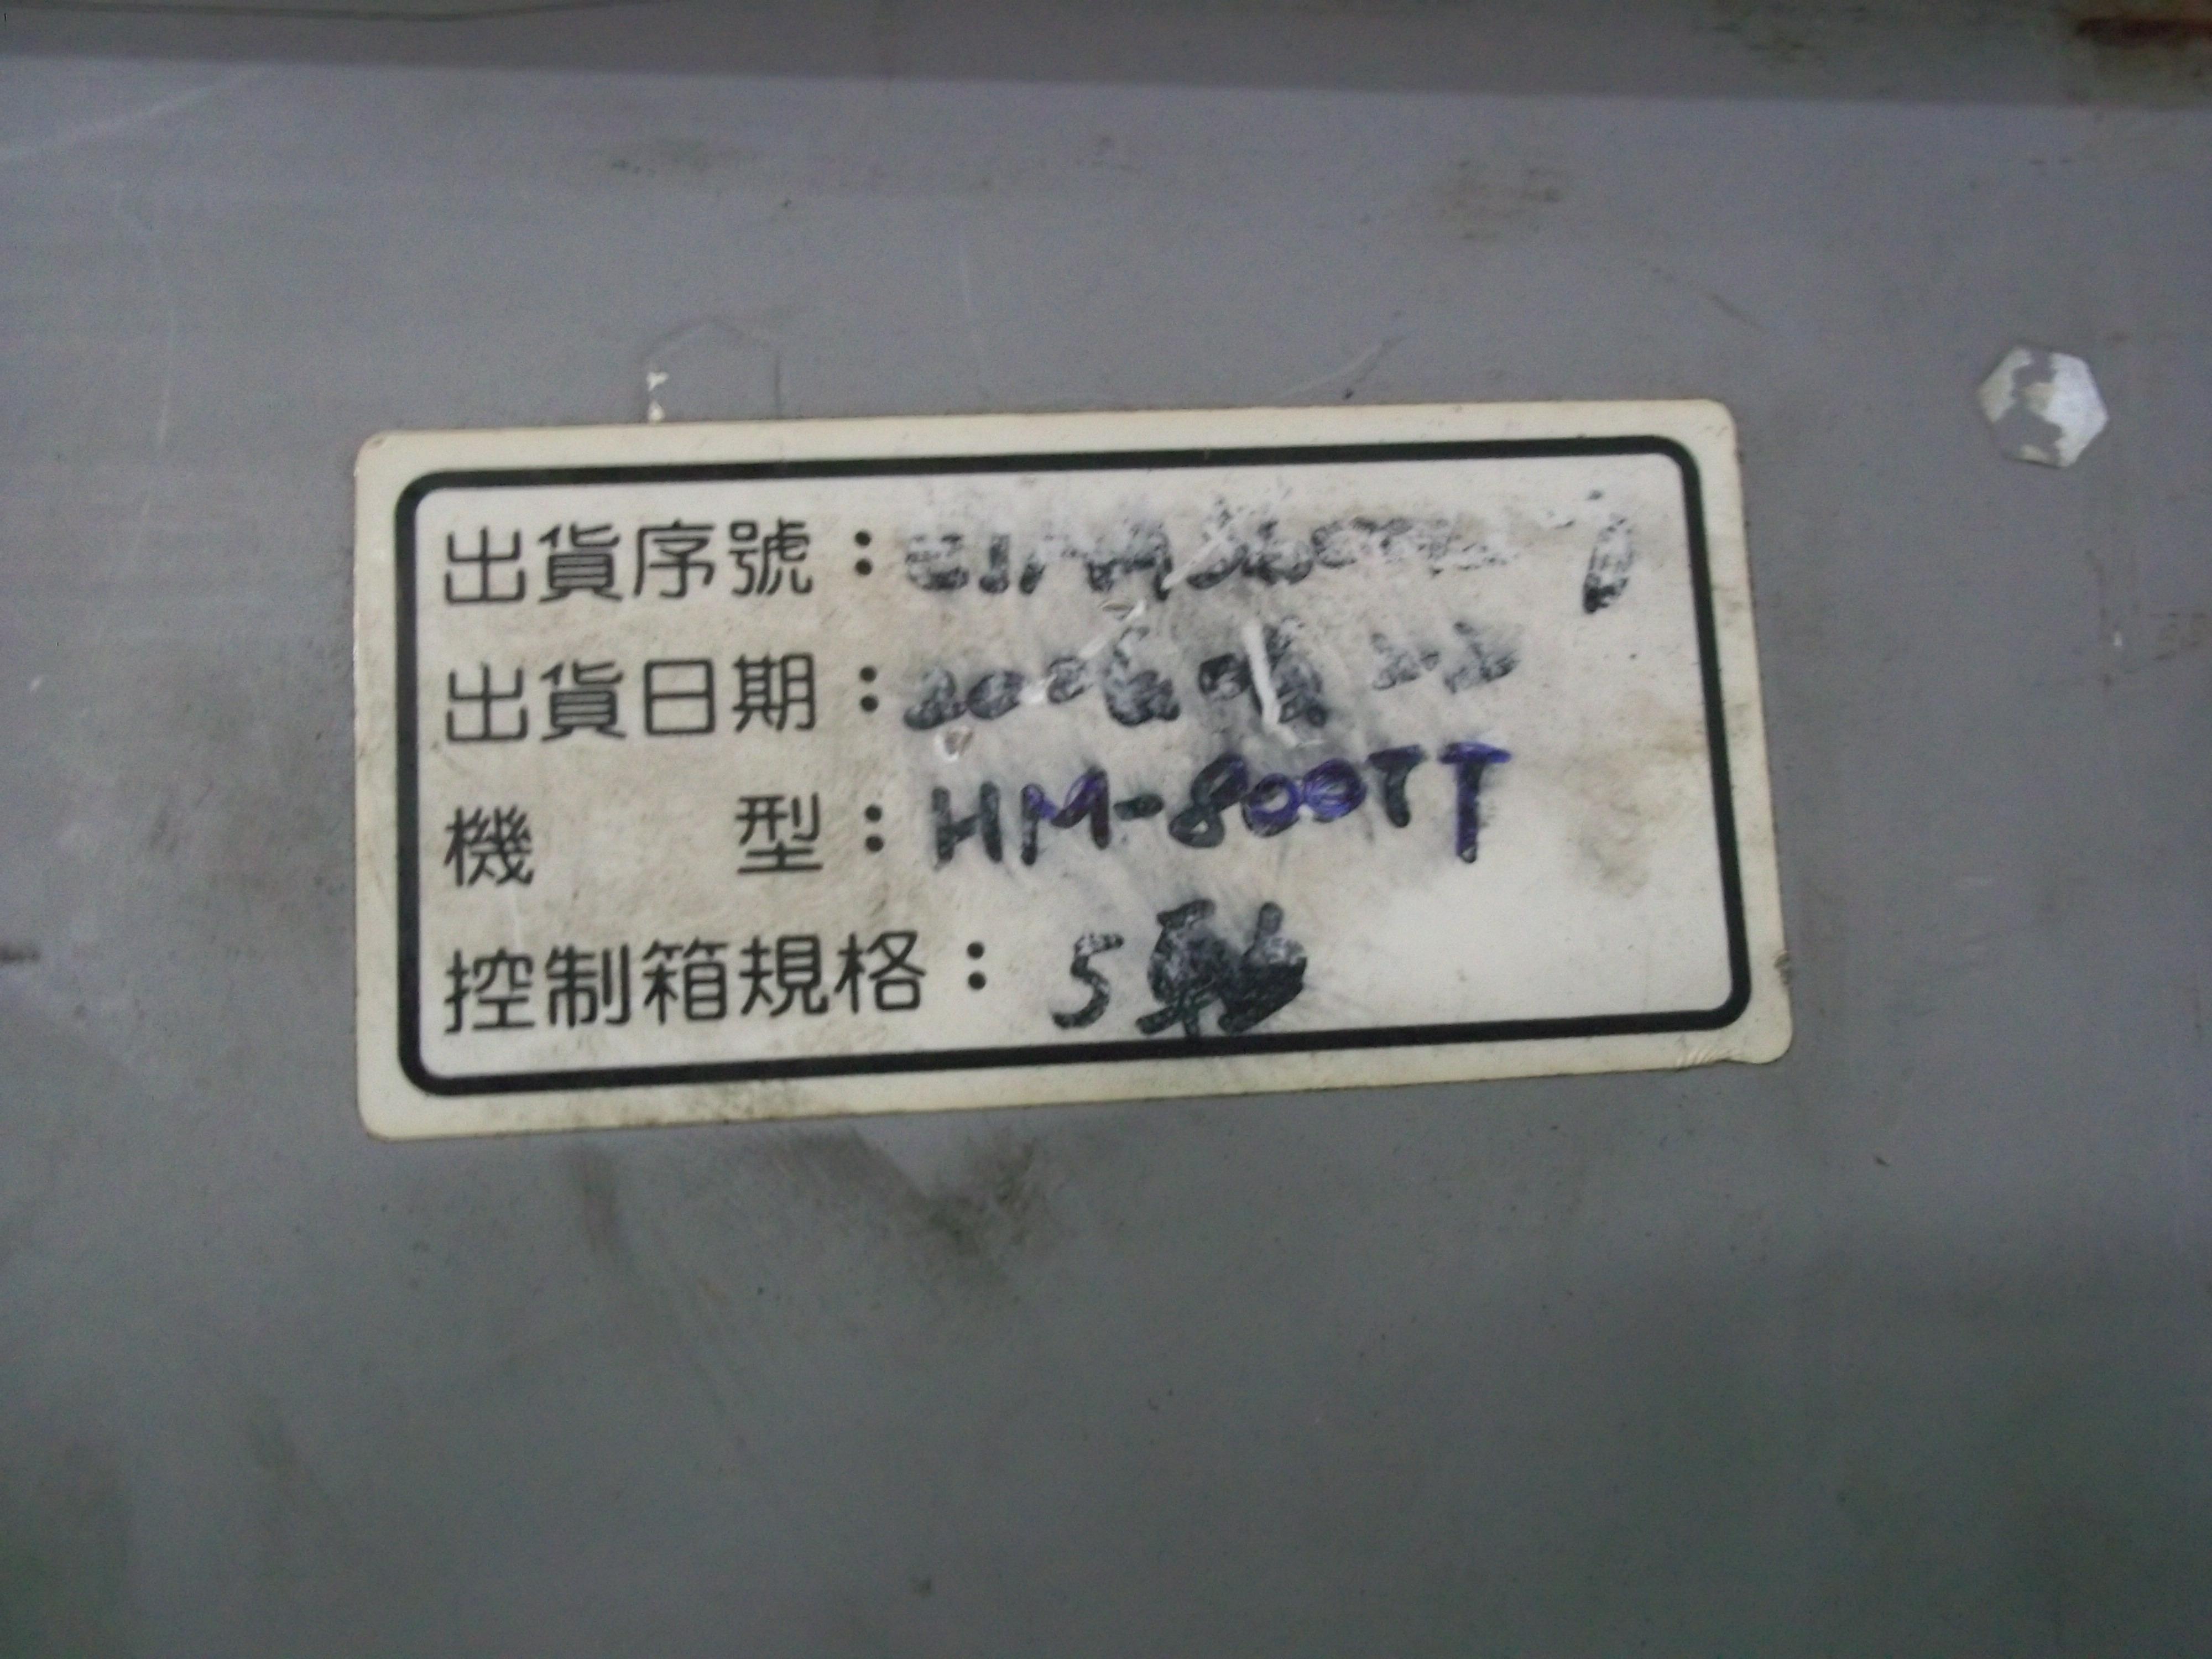 Repair HM-800TT HEMINGSTONE L HEMINGSTONE SERVO MOTOR CONTROL in Malaysia, Singapore, Thailand, Indonesia